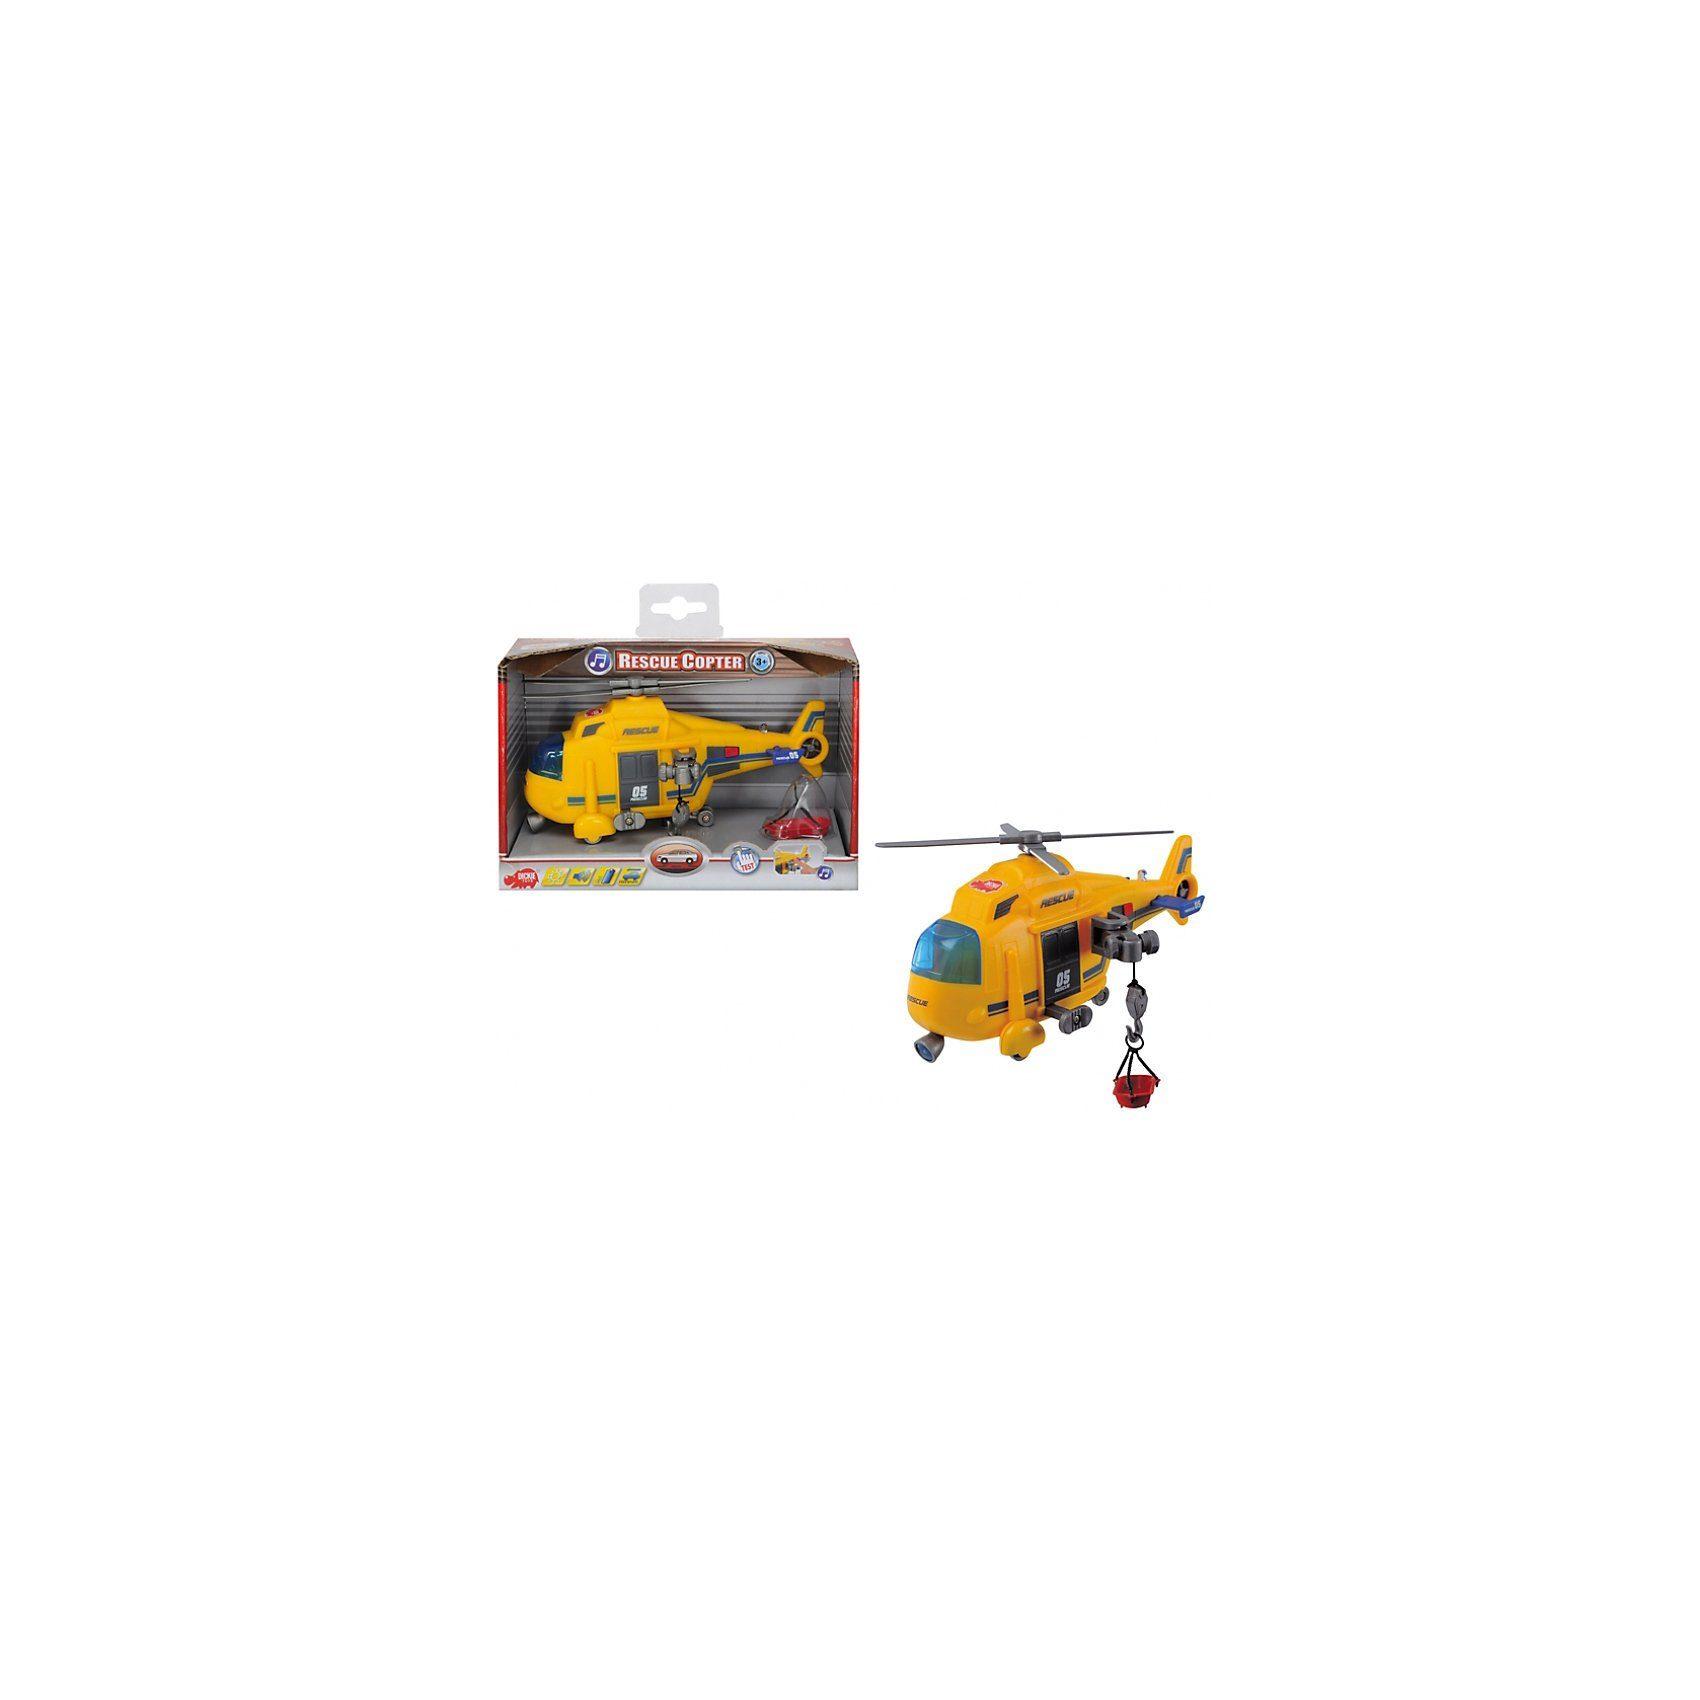 Dickie Toys Rettungs-Hubschrauber